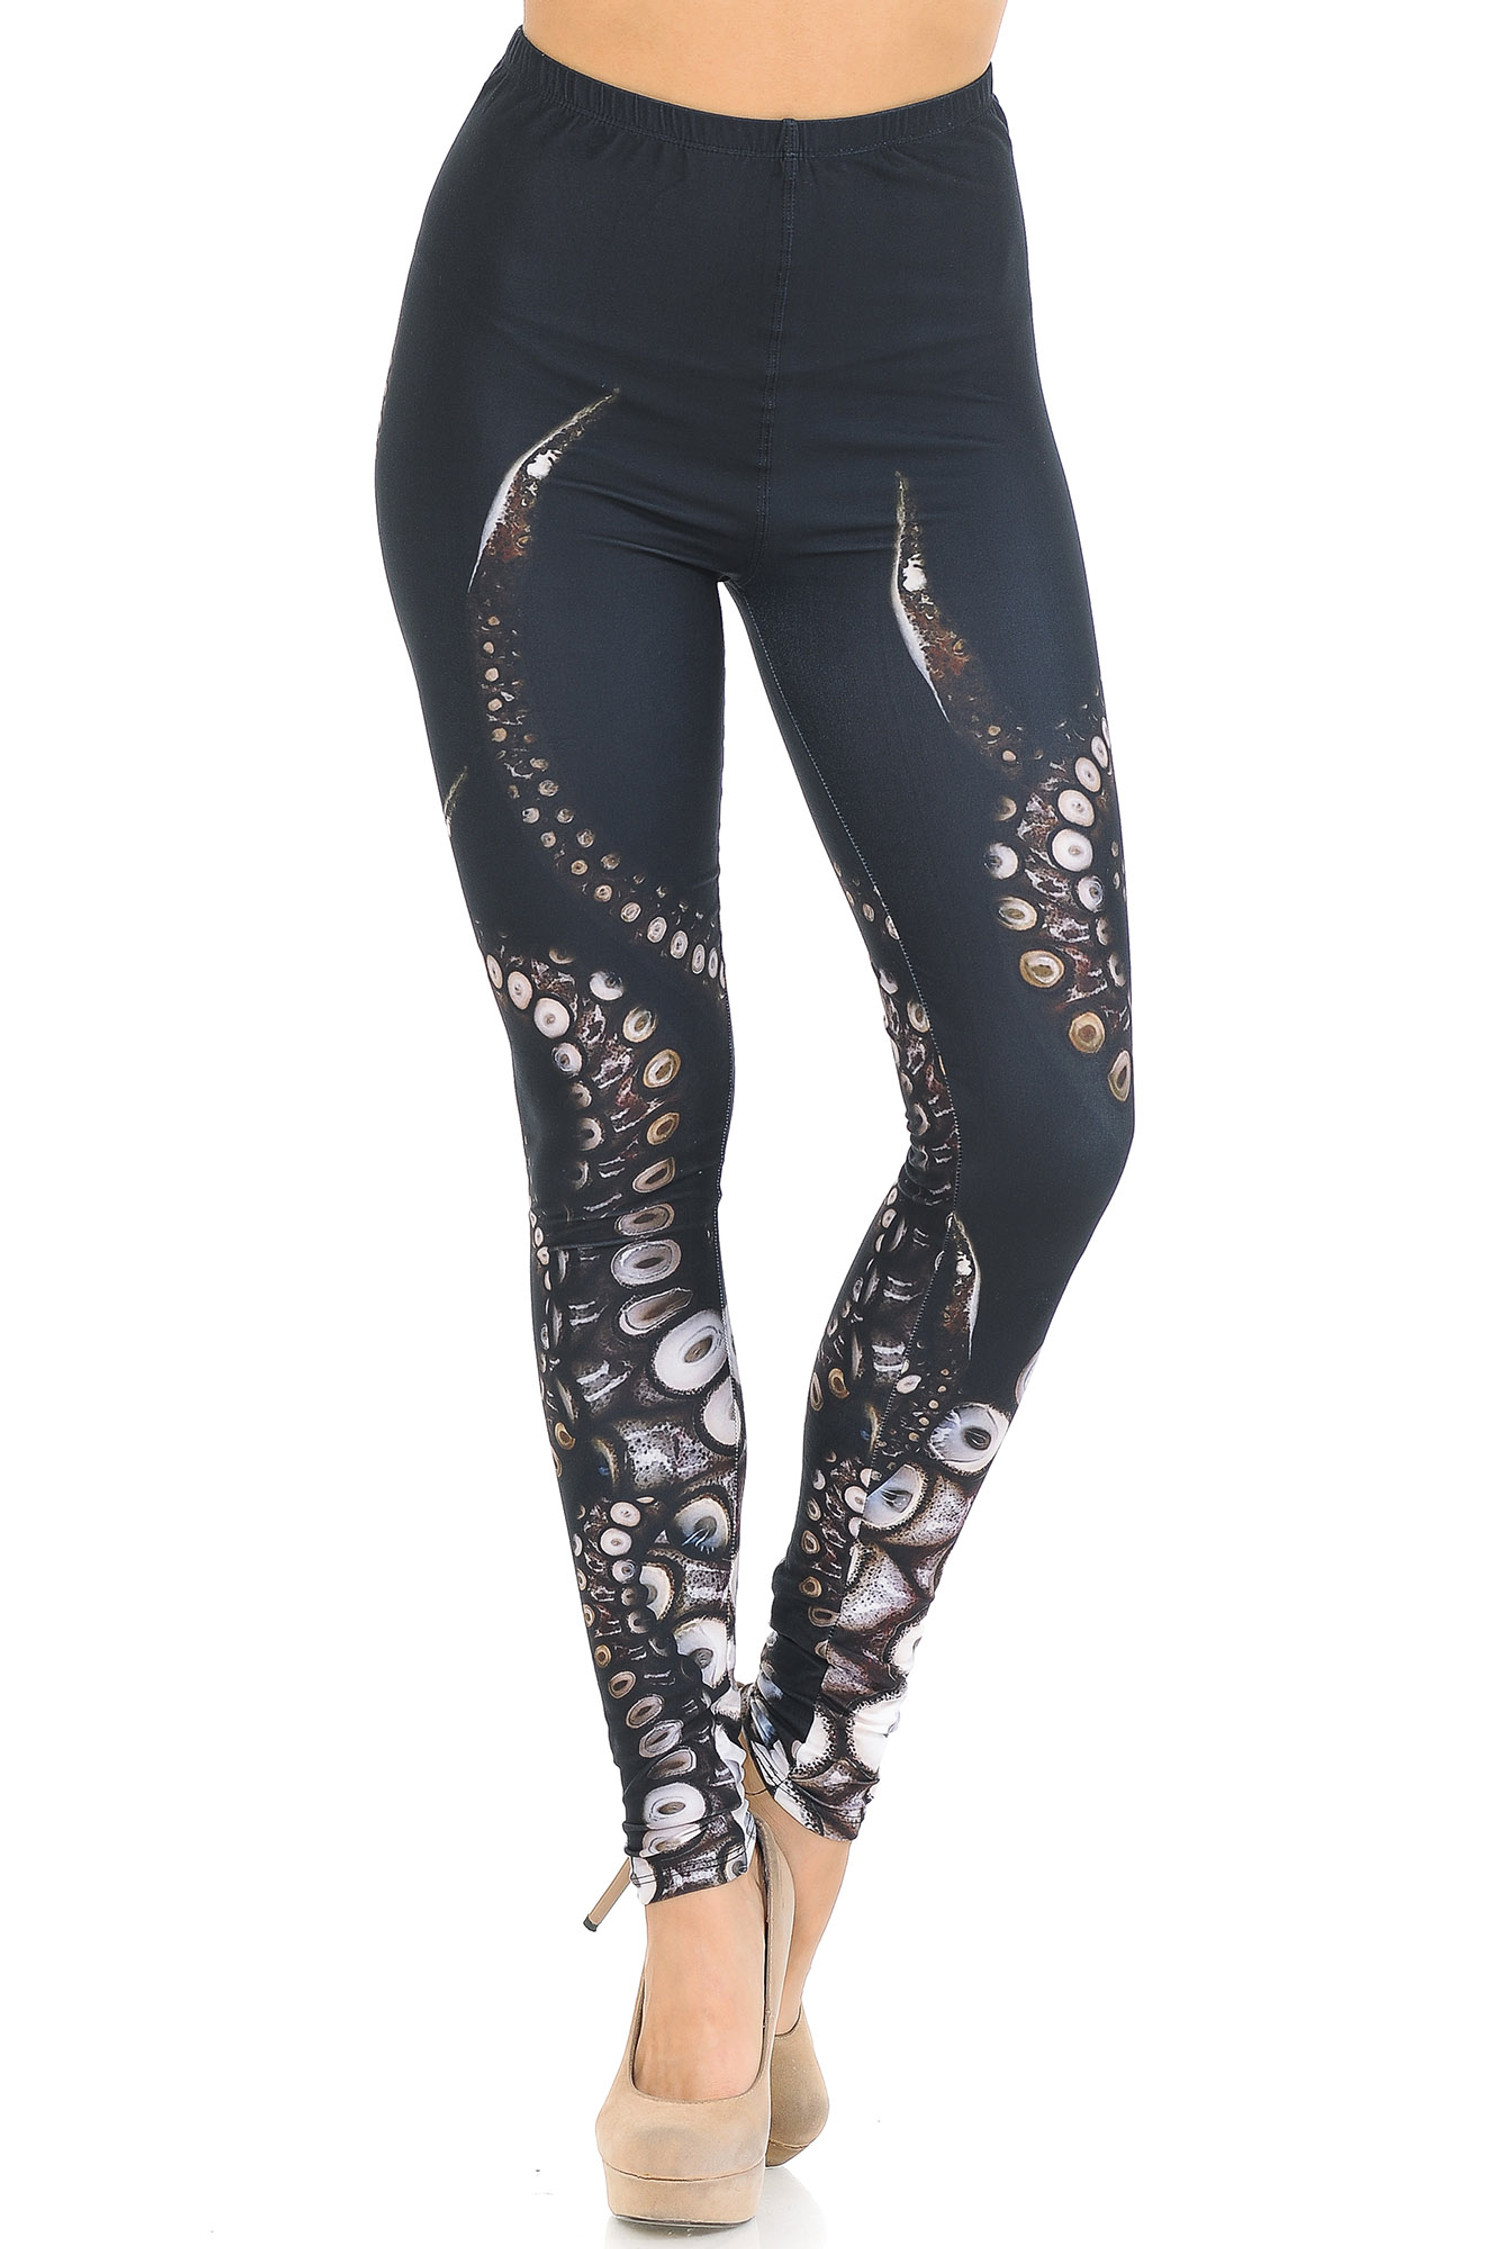 Creamy Soft Tentacle Leggings - USA Fashion™